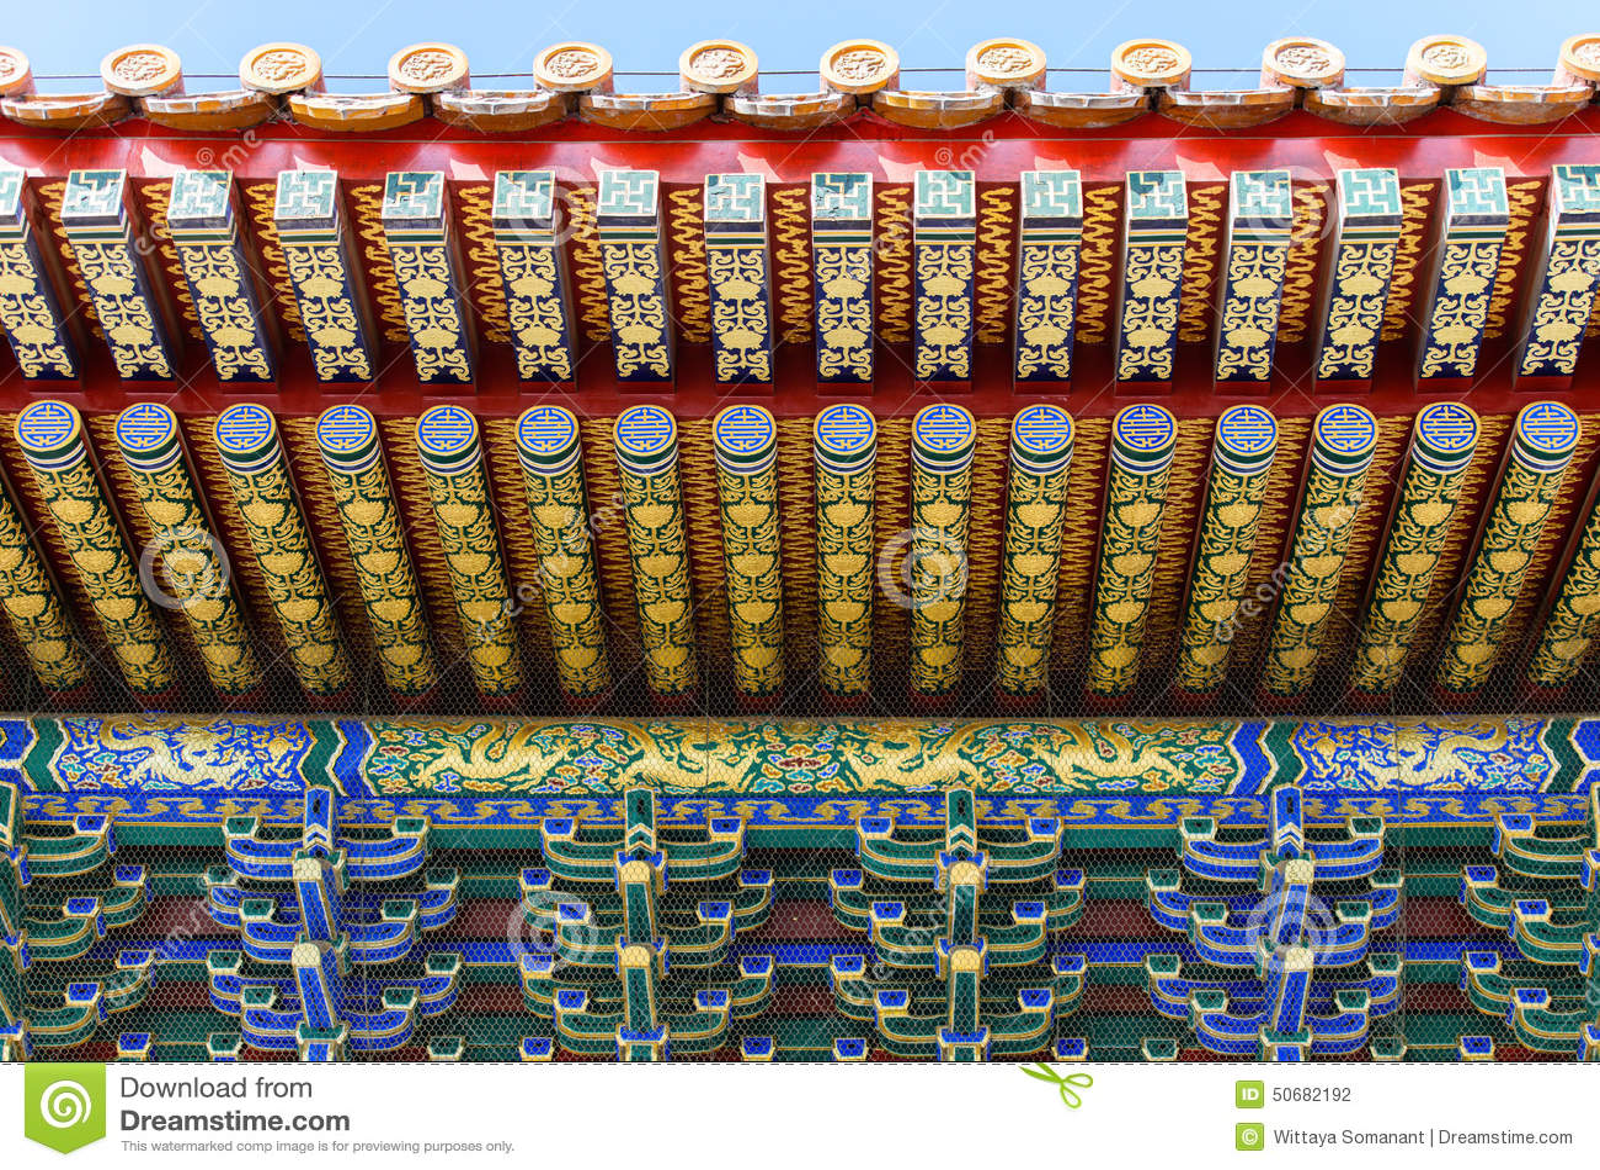 Download 装饰的最高限额 库存照片. 图片 包括有 汉语, 聚会所, 小雕象, 上色, 共产主义, 图象, 旁观者 - 50682192